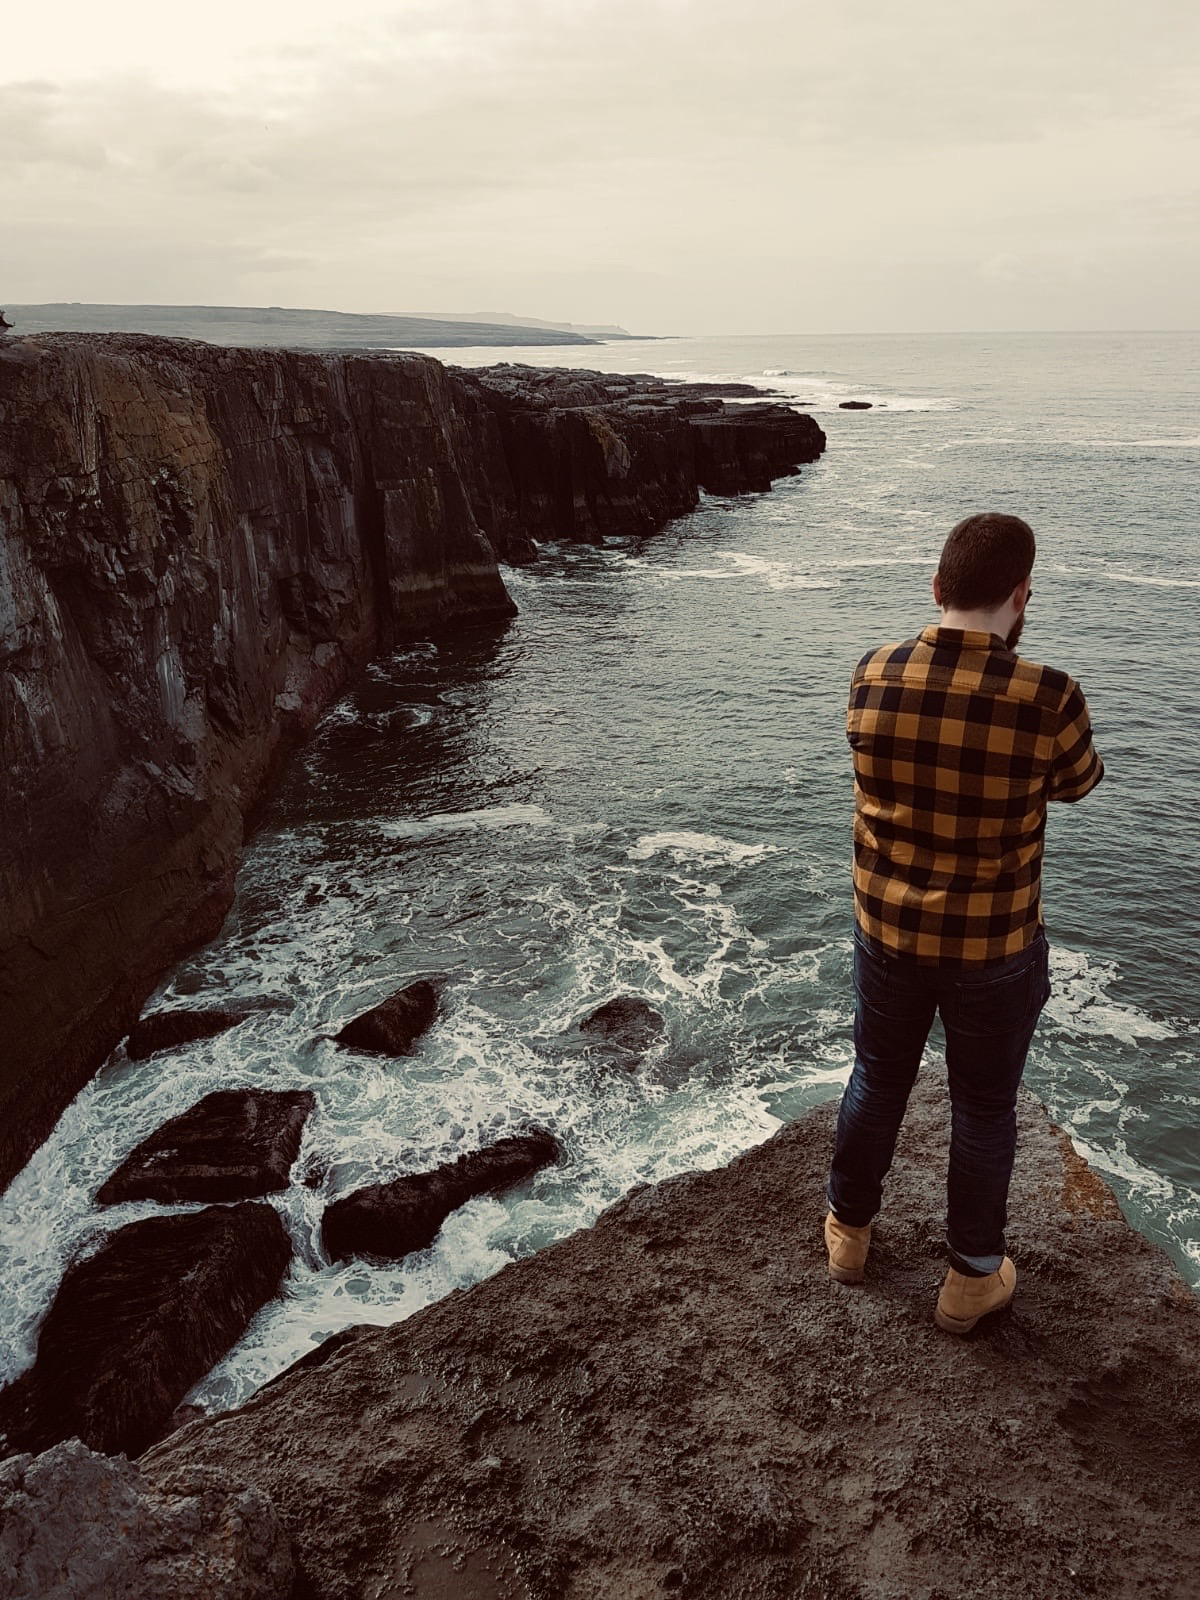 Nick Van Loy, a travel writer from Belgium